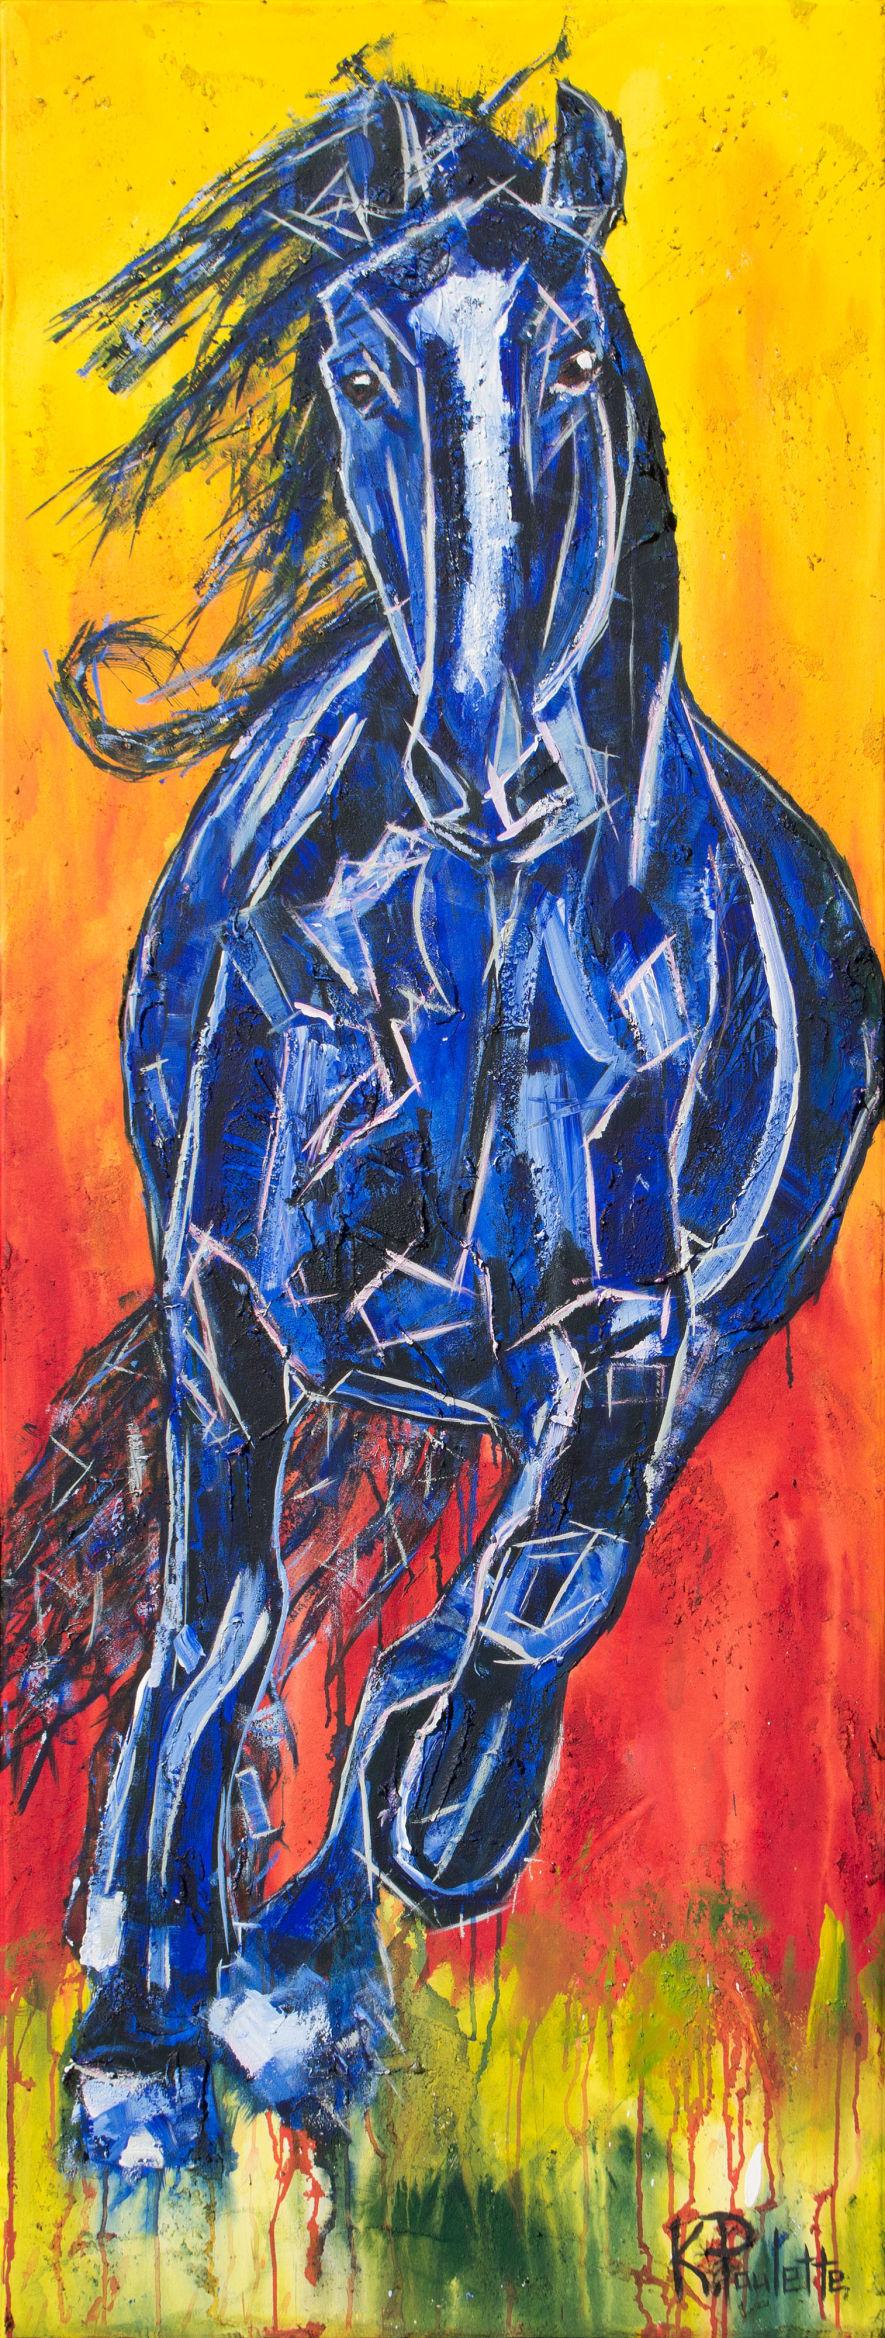 "'Running Wild' (74"" x 28"") by Kent Paulette"